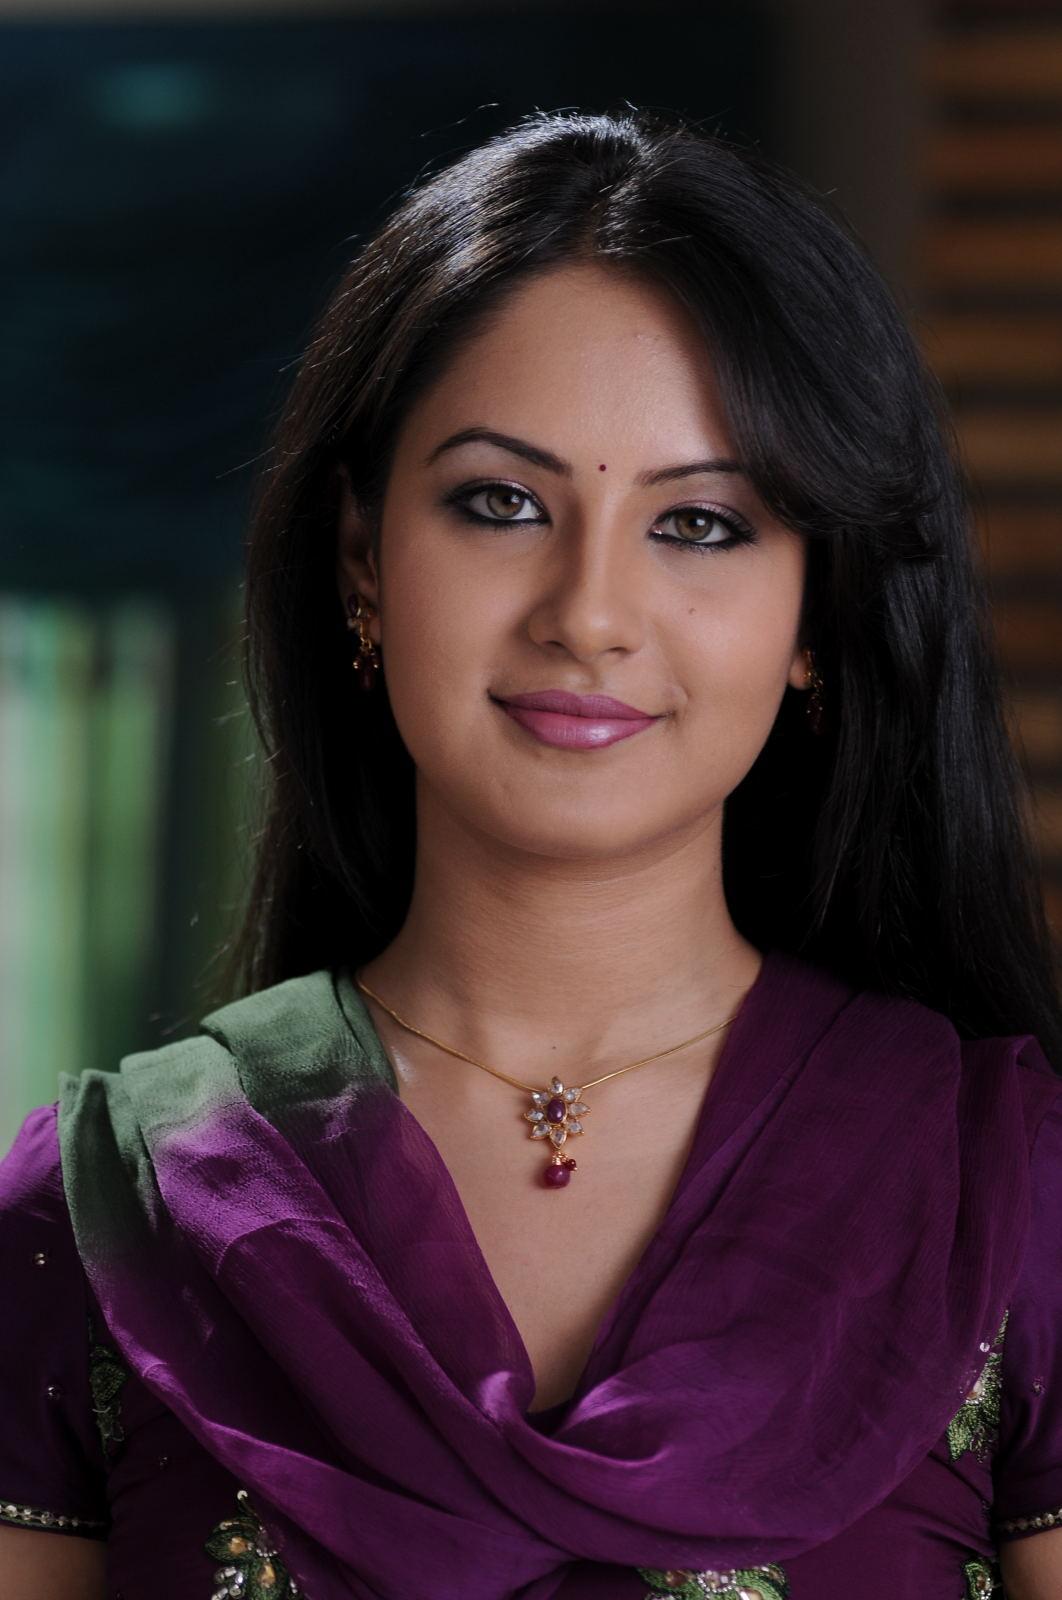 Shanvi Cute Hd Wallpapers Tollywoodcinephotos Pooja Bose Latest Stills